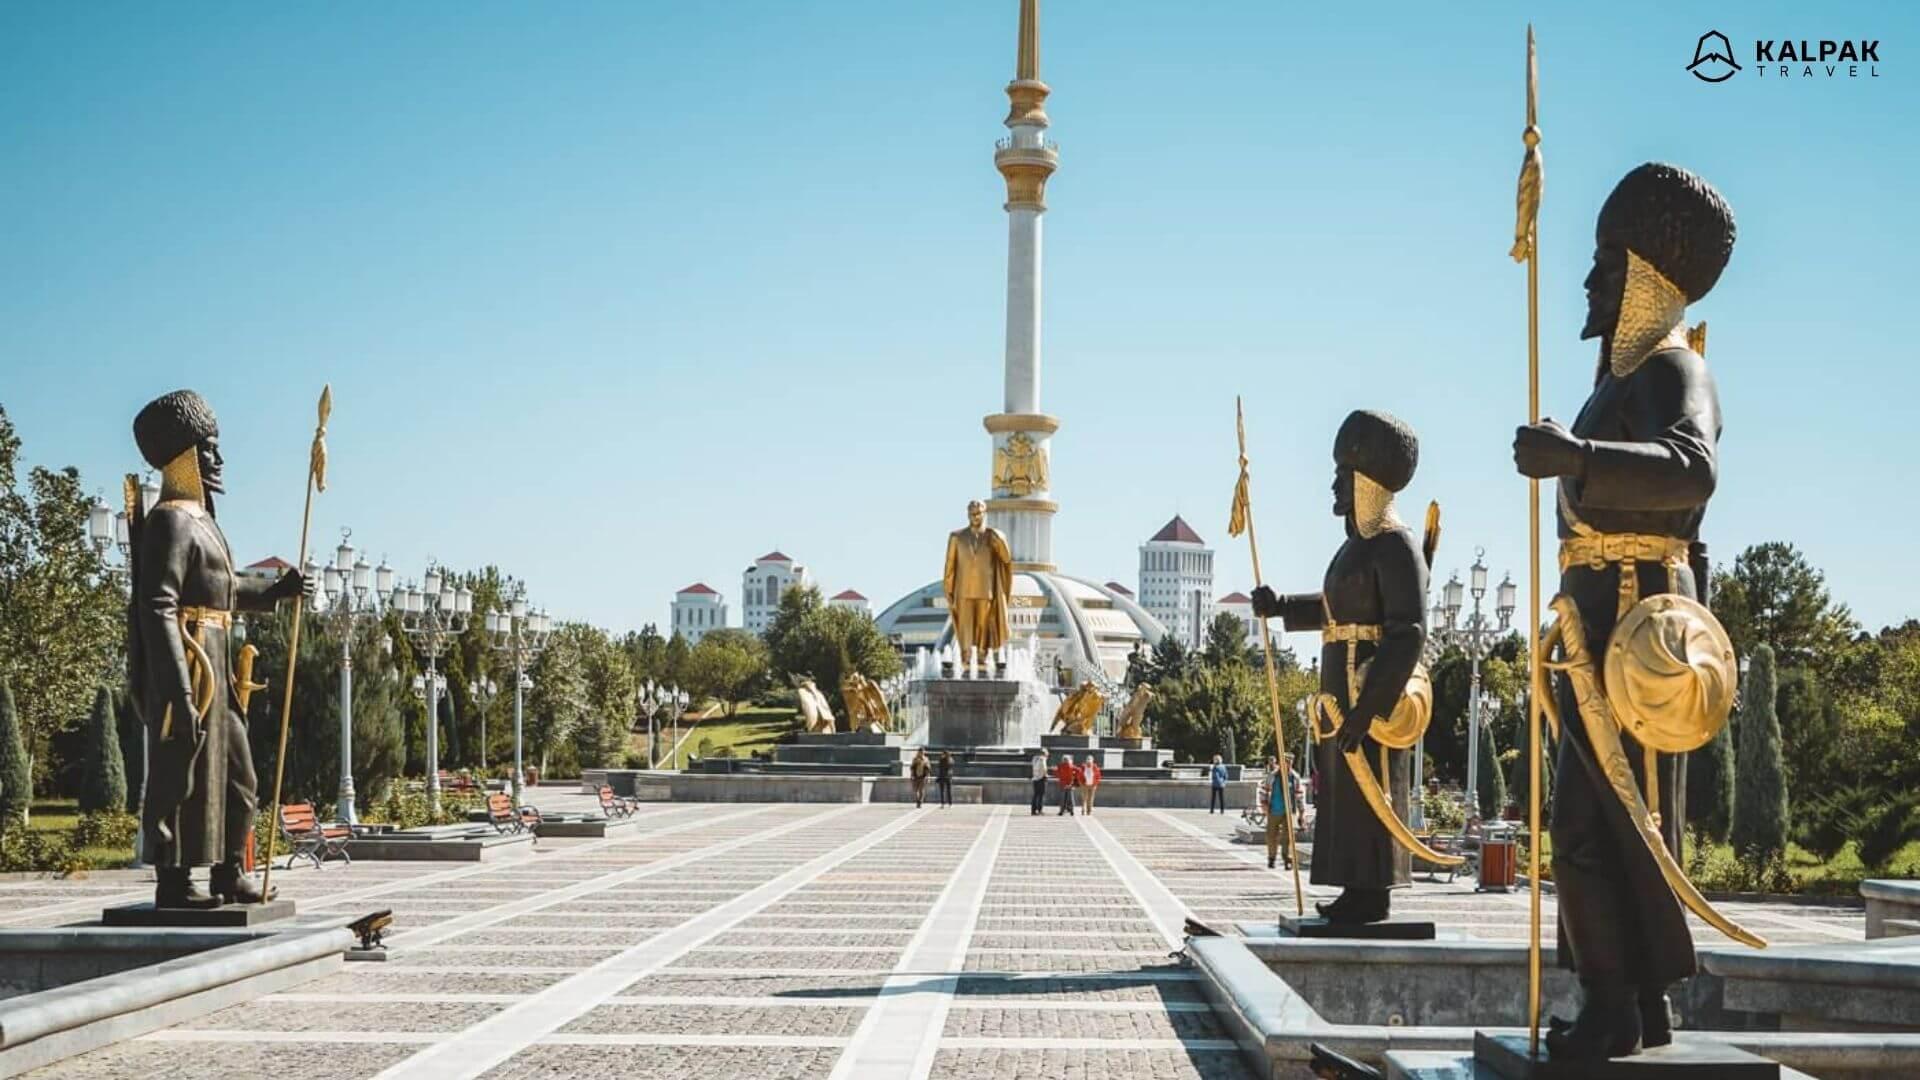 Zentralasien Aschgabat Turkmenistan